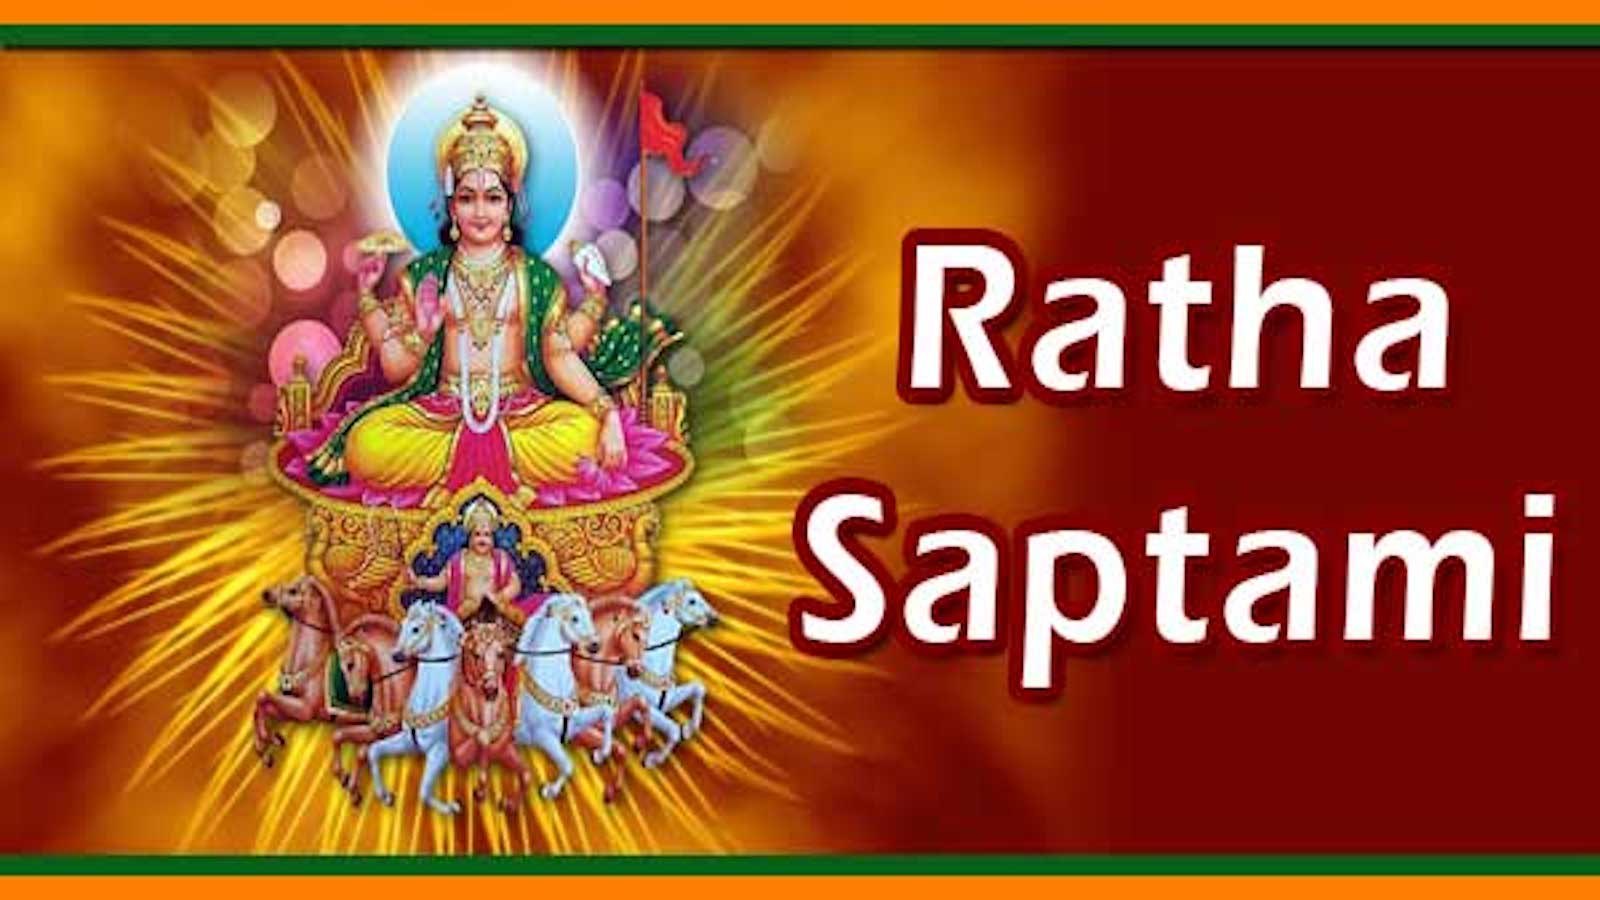 Ratha Sapthami – 02/18 @ 6.30 PM